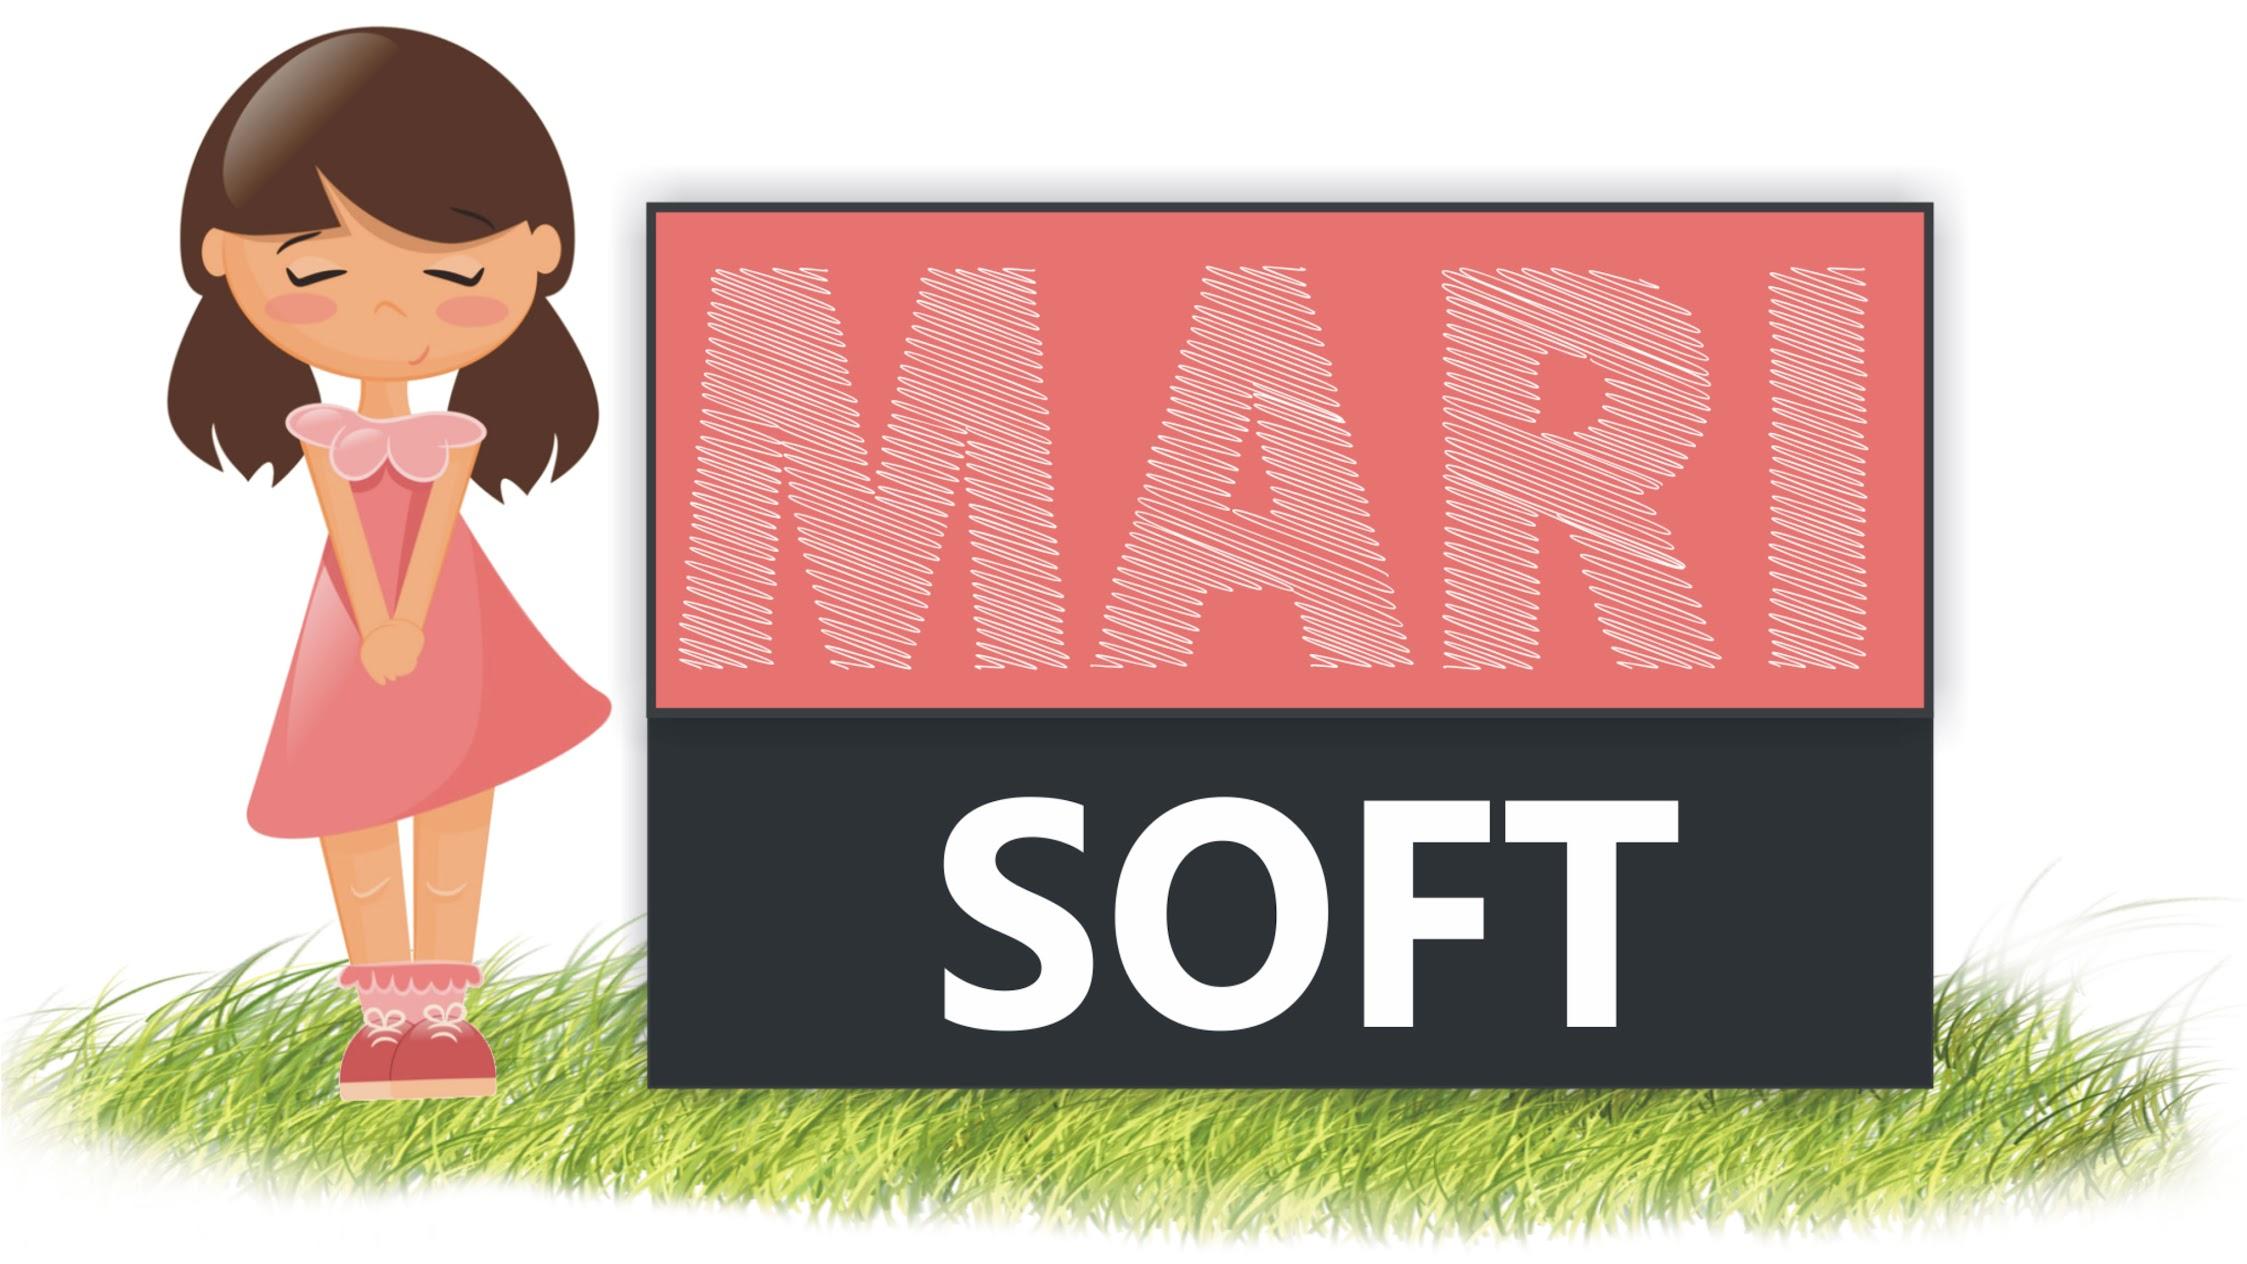 MariSoft